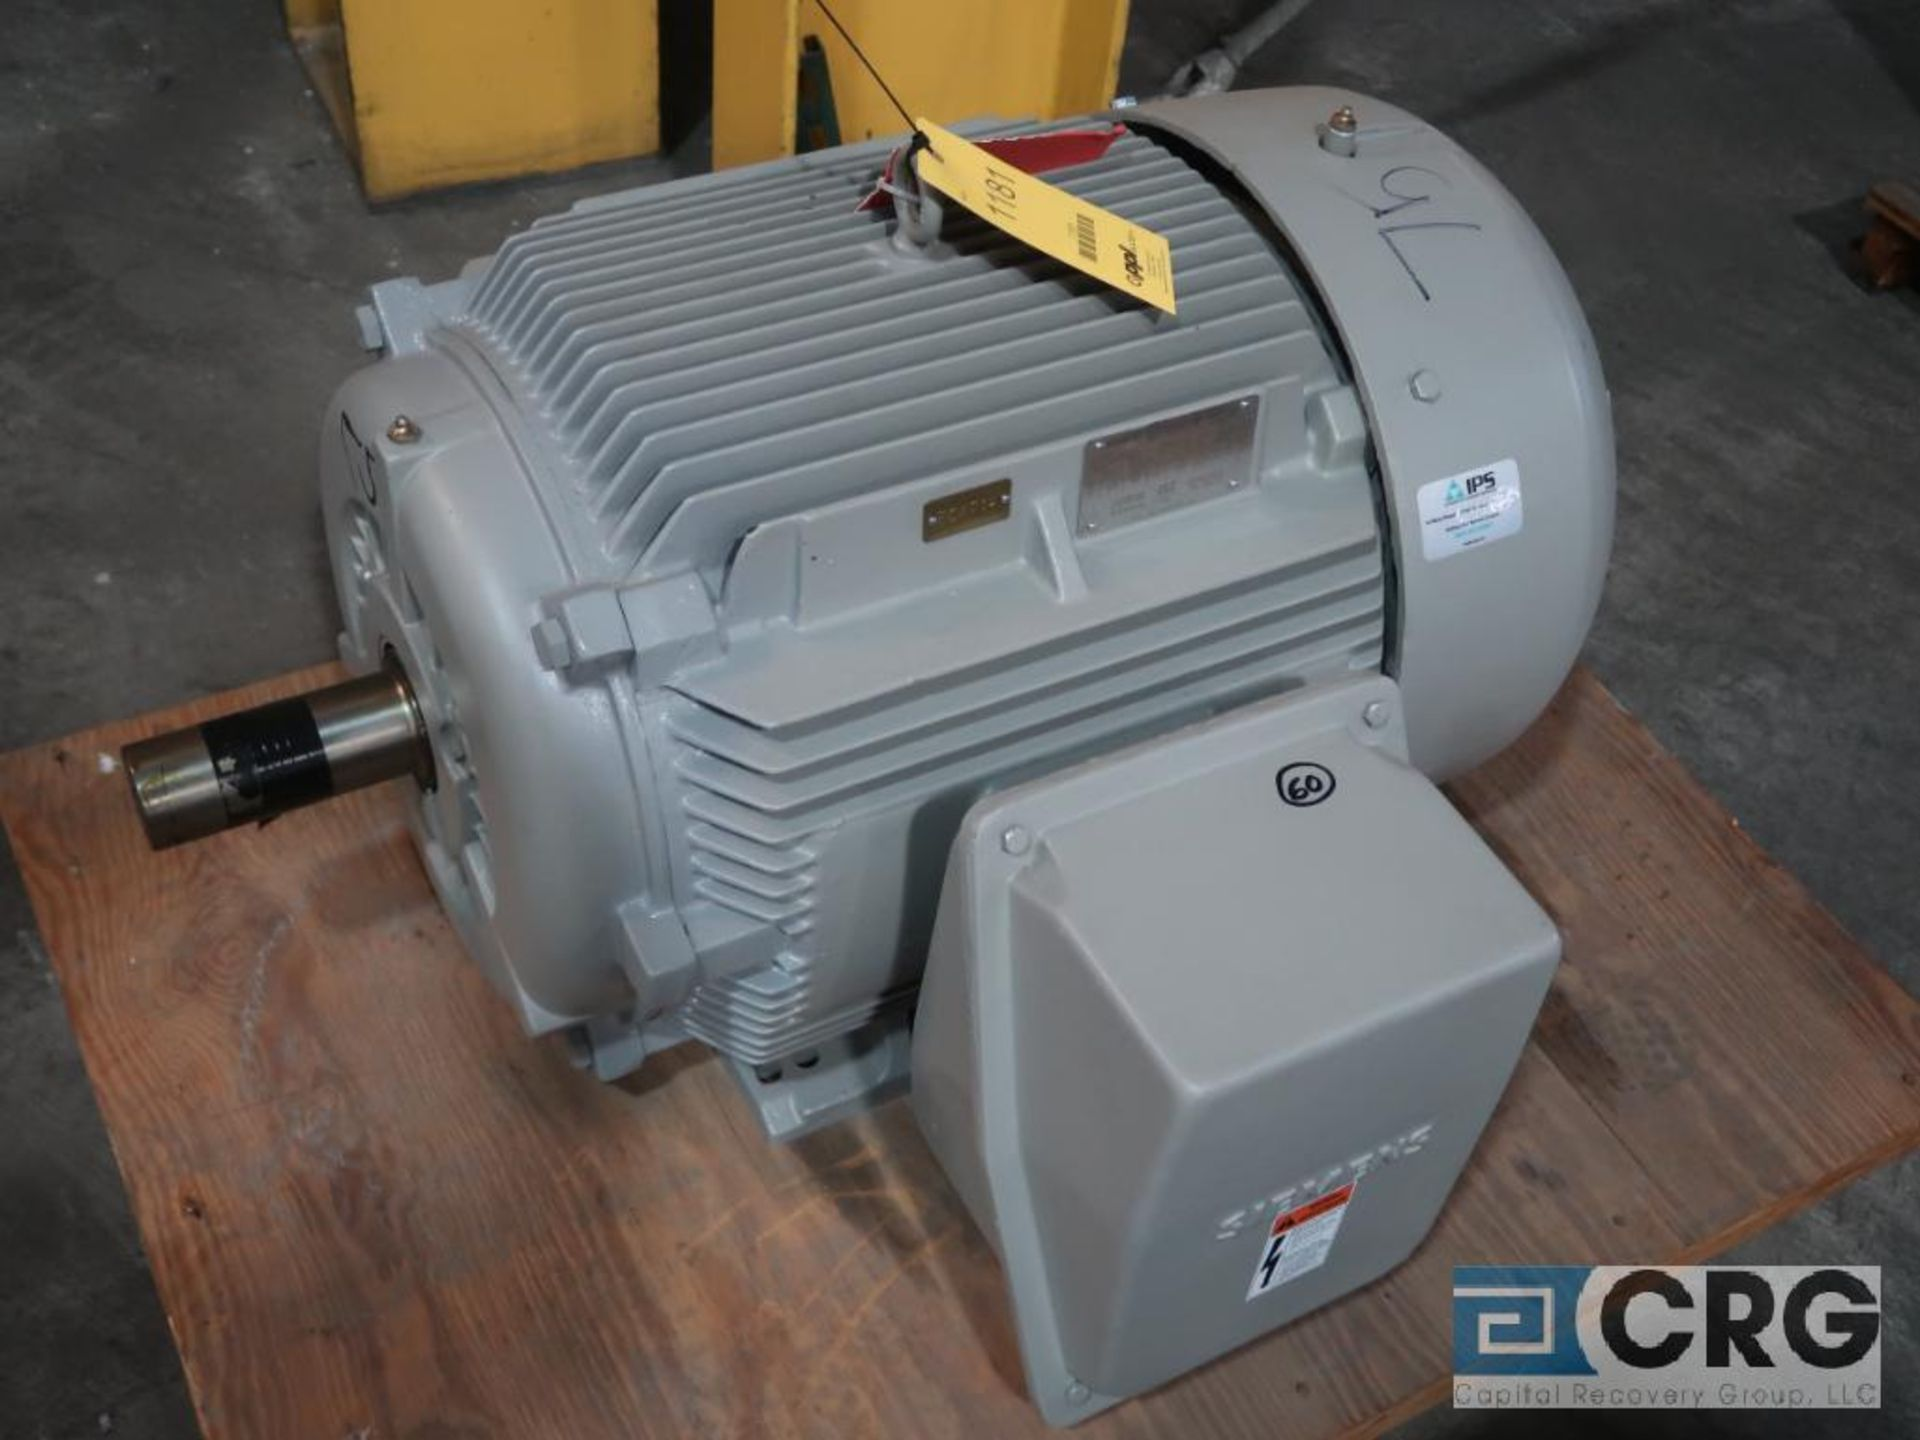 Siemens NEMA Premium motor, 75 HP, 1,780 RPMs, 460 volt, 3 ph., 365T frame (Finish Building)